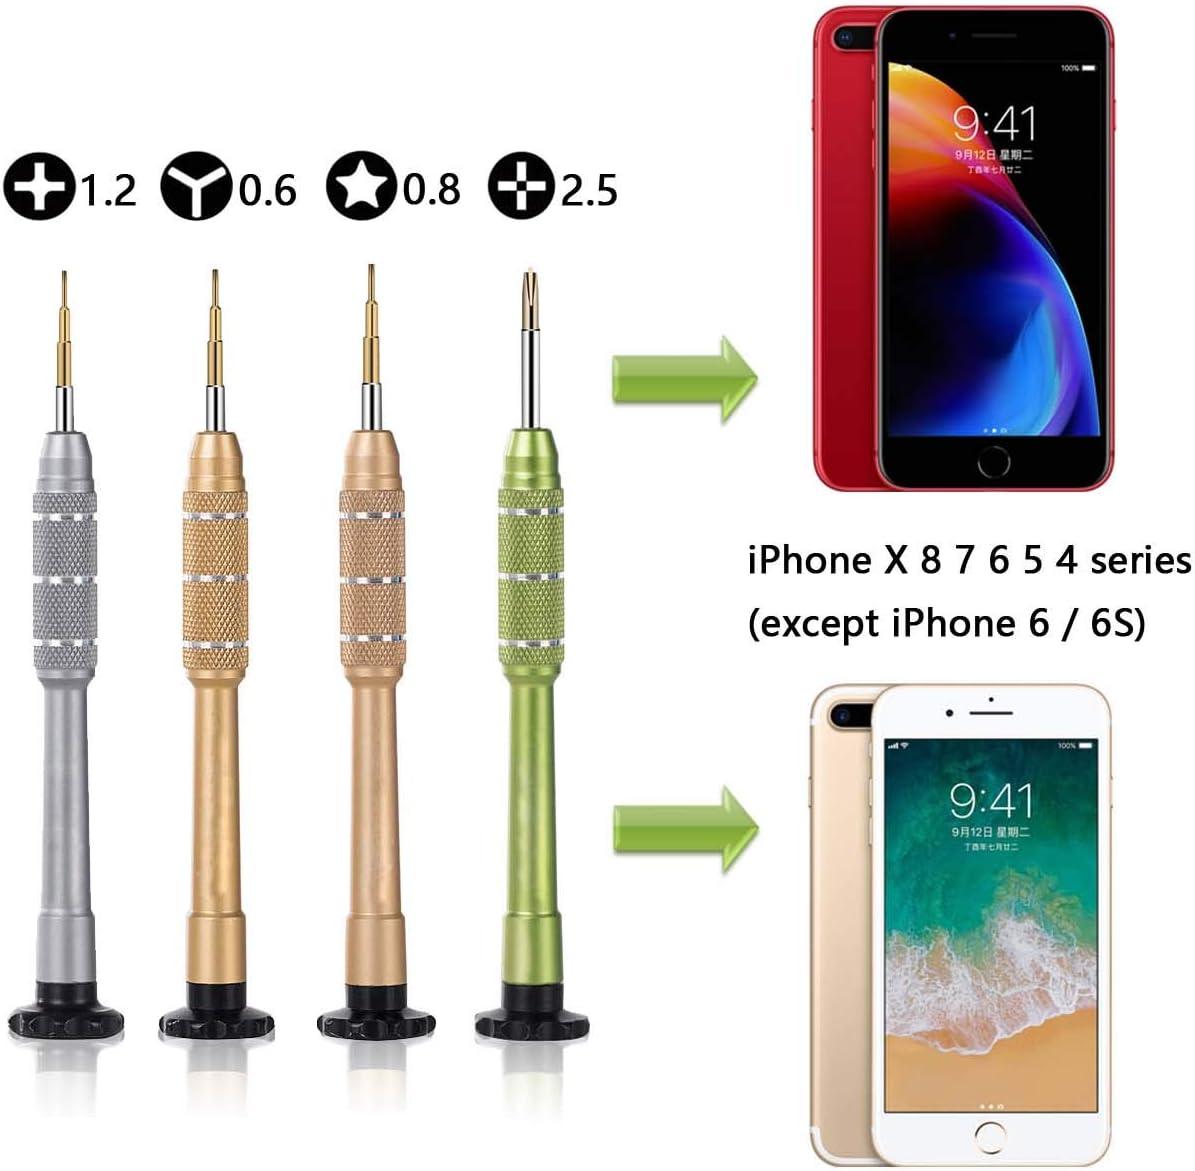 Set de iPhone de Destornillador de Herramientas de Reparar para iPhone Xr, X, 8, 8 Plus, 7, 7 Plus, 6, 6 Plus, 6S, 6S Plus, 5, 5S, 5C, 4, SE - Kit de ...